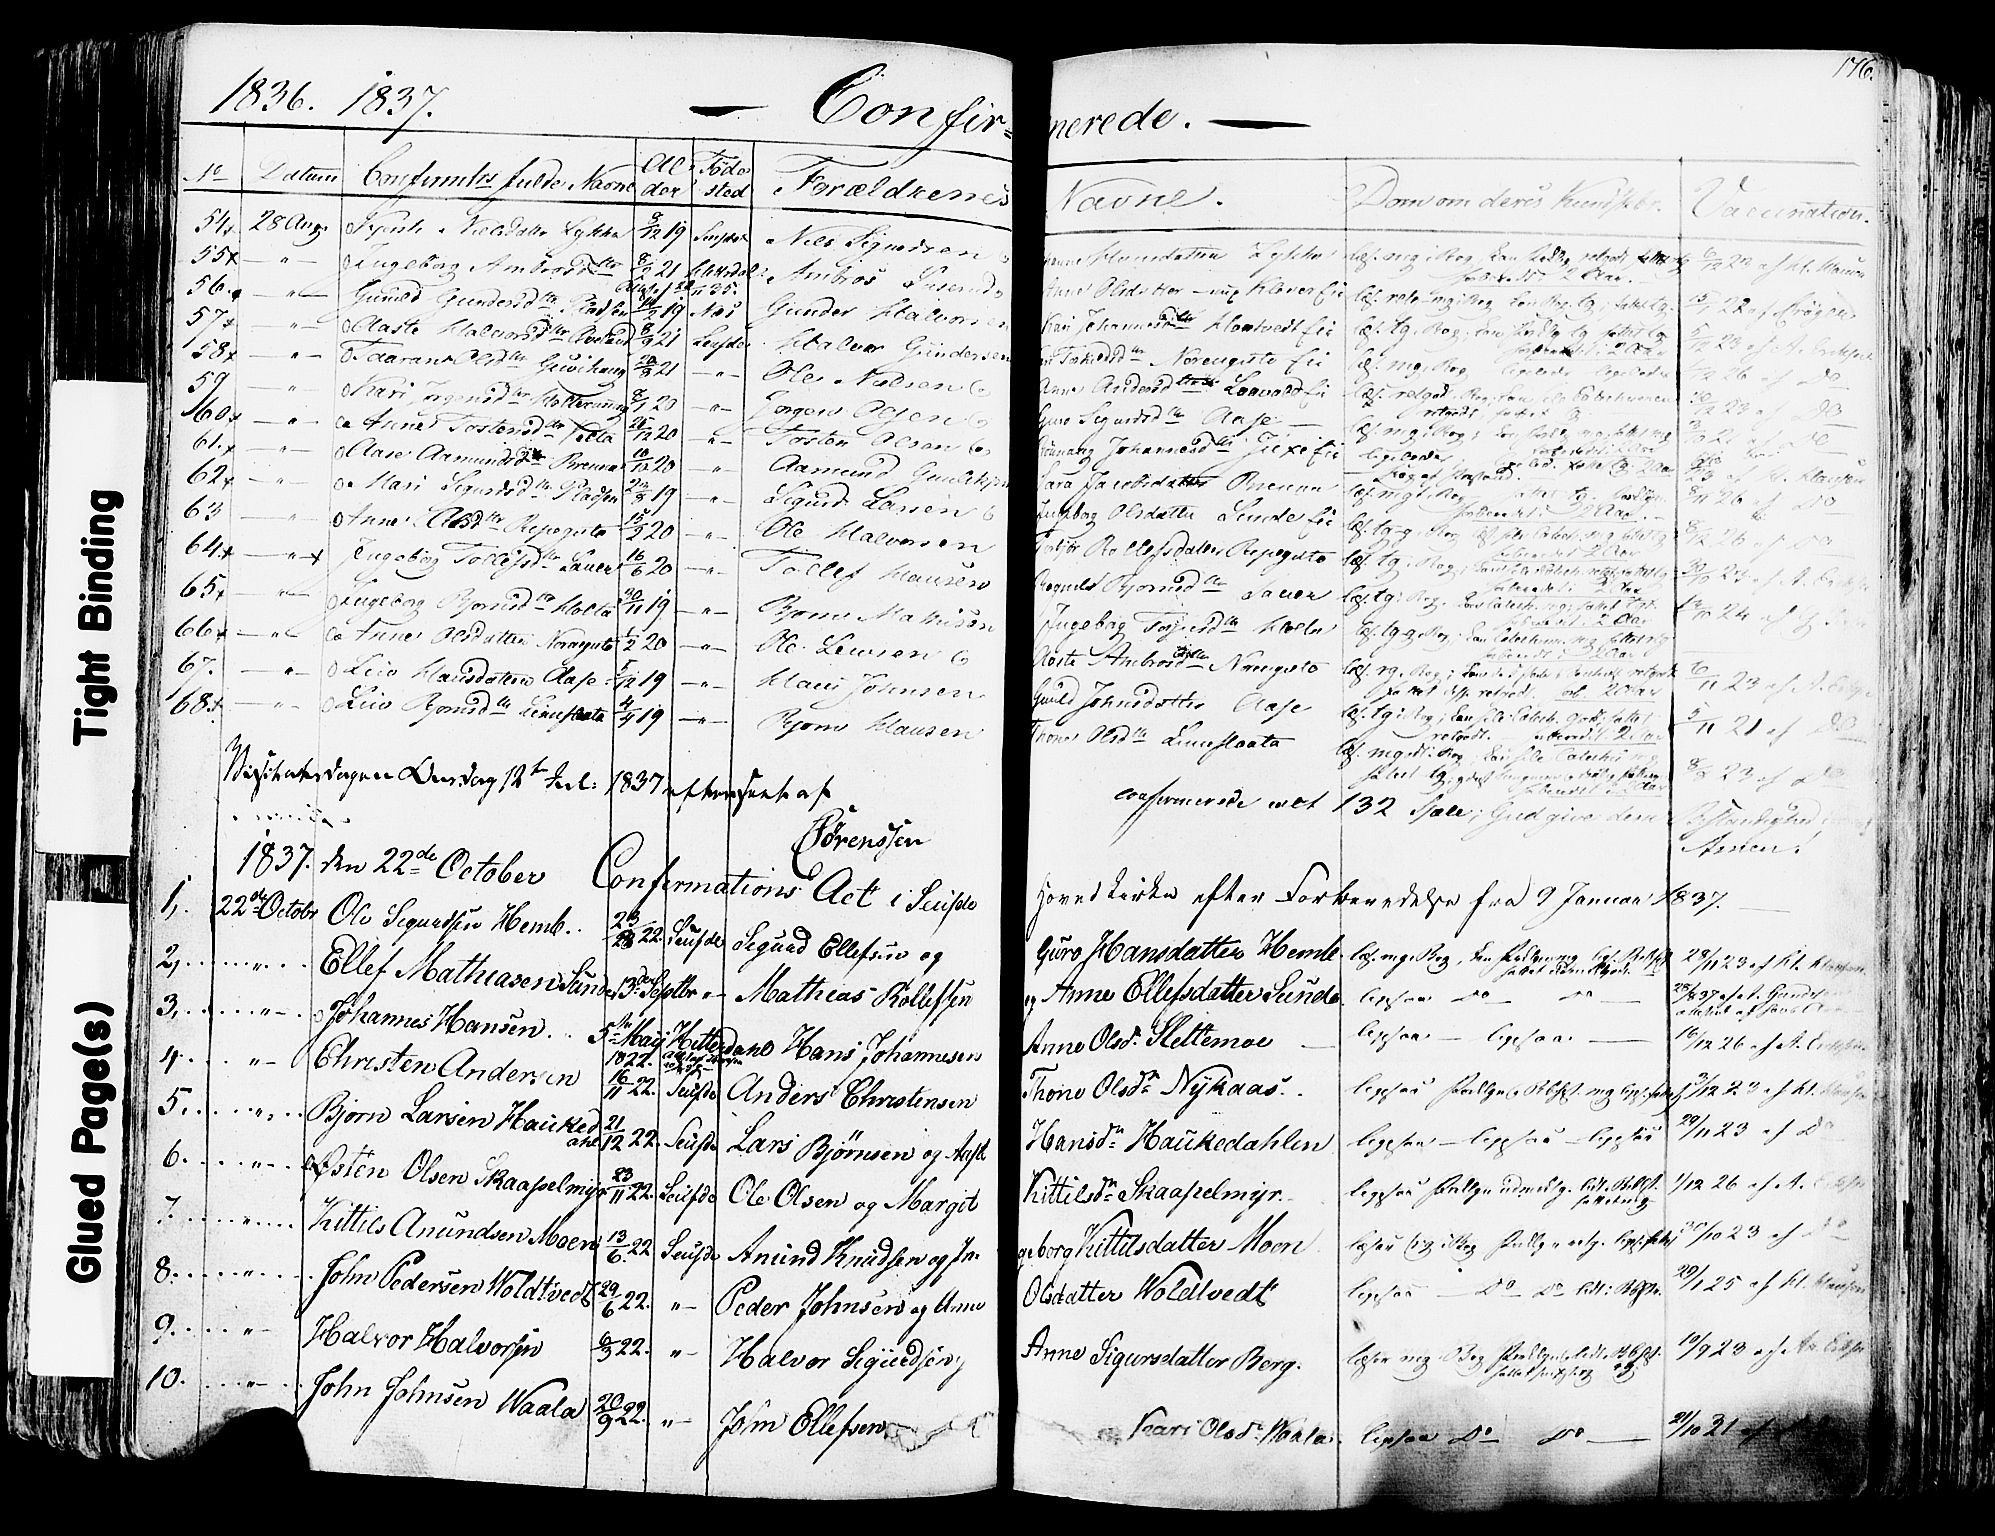 SAKO, Sauherad kirkebøker, F/Fa/L0006: Ministerialbok nr. I 6, 1827-1850, s. 176